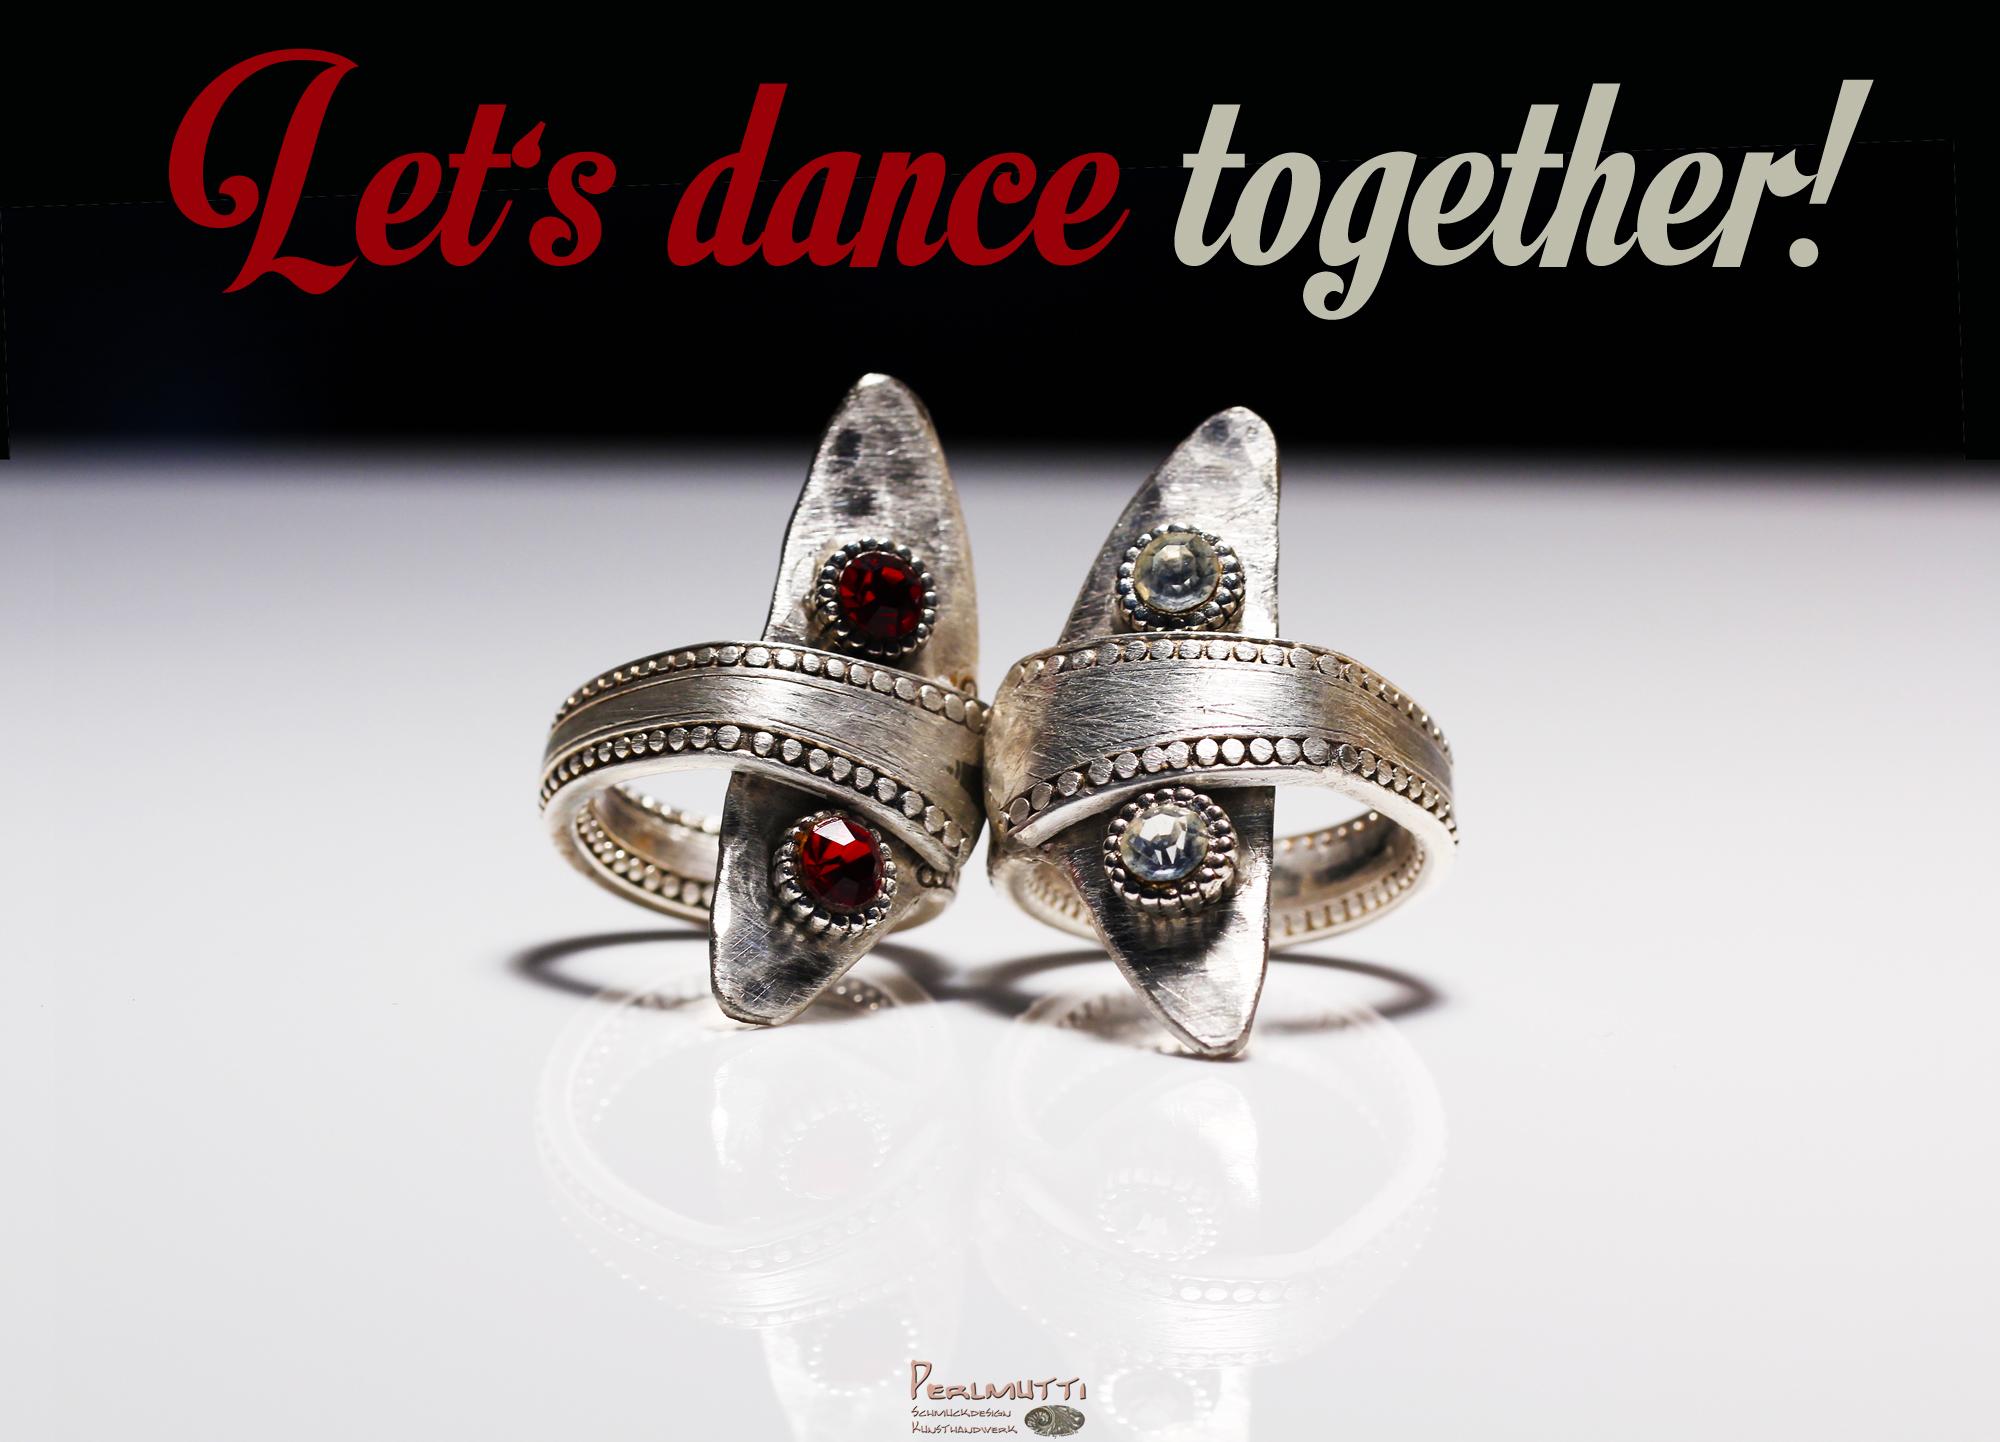 Perlmutti_2014_Lets-dance-together